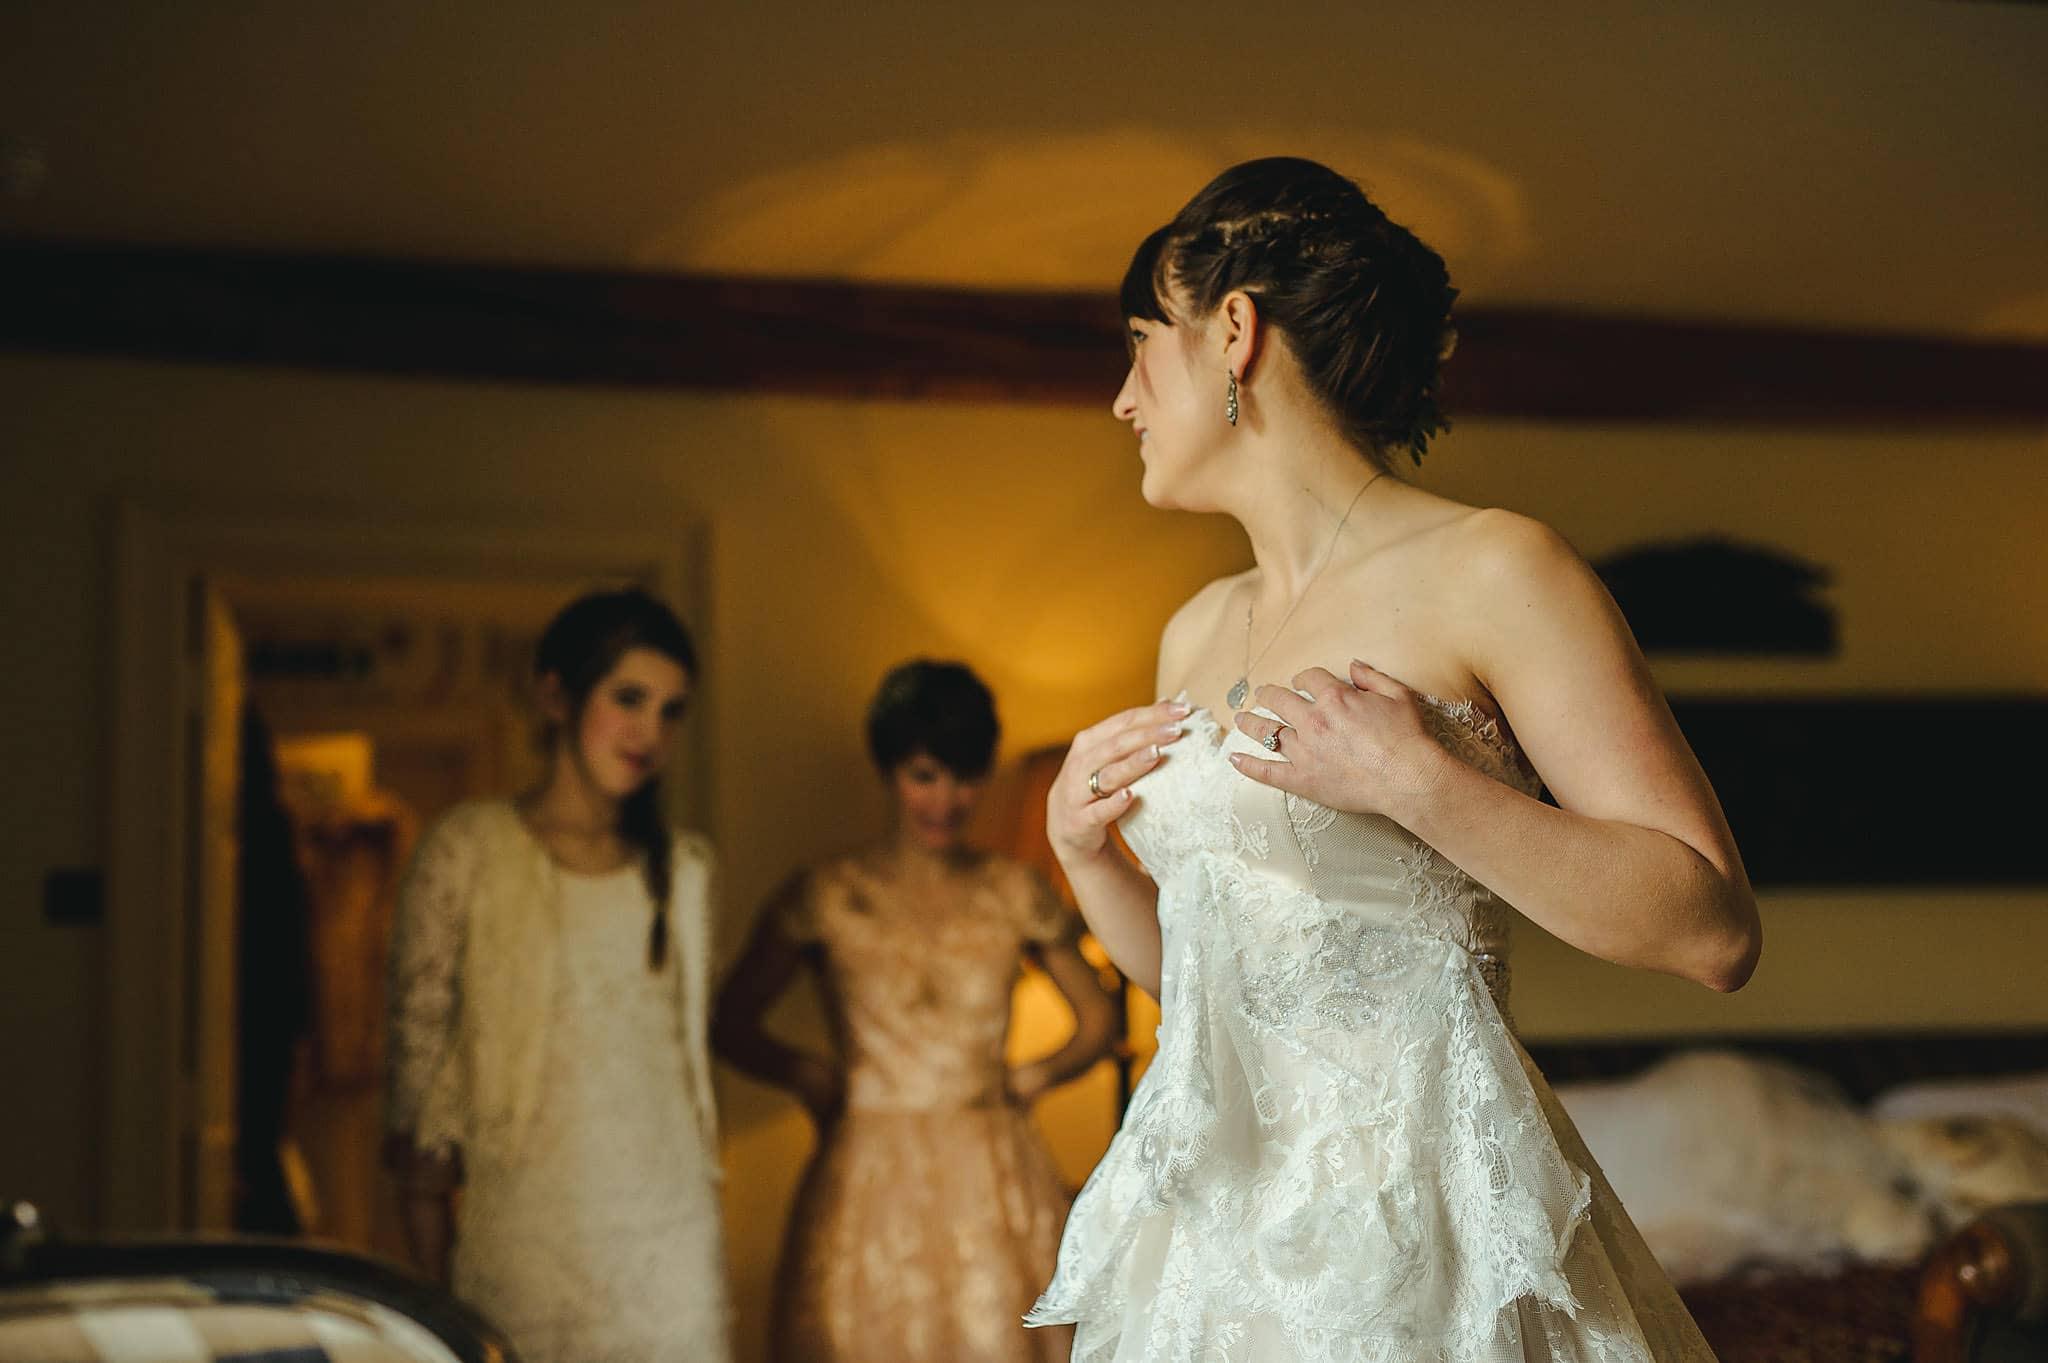 Dewsall Court wedding photography Herefordshire | Laura + Alex 8